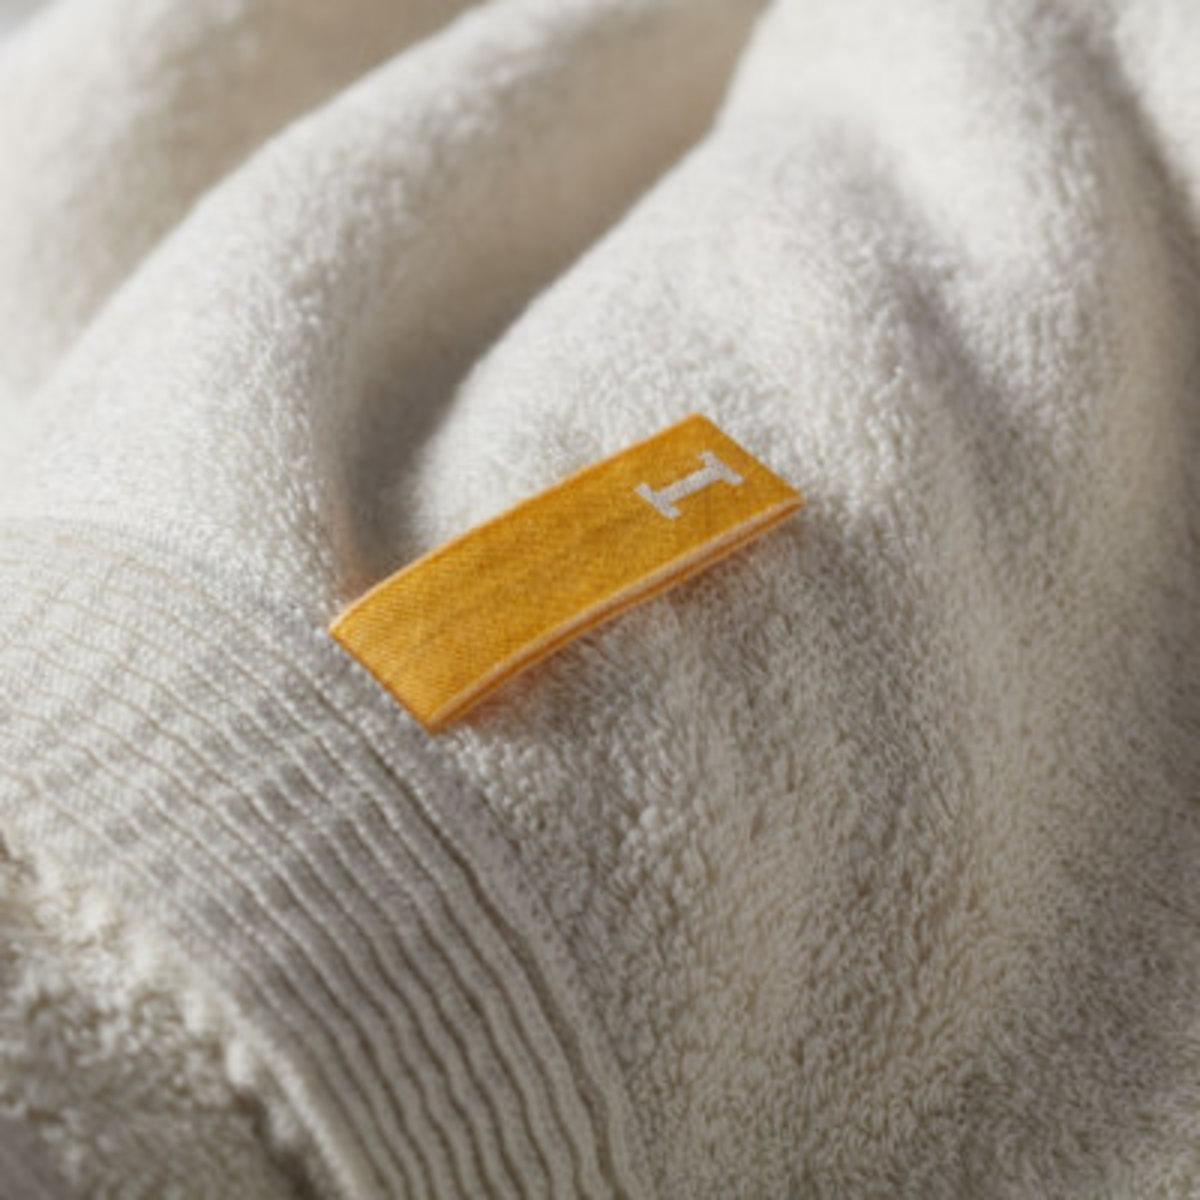 Organic 960 面巾 - Ivory 全日本製有機毛巾 日本今治毛巾認證 日本毛巾